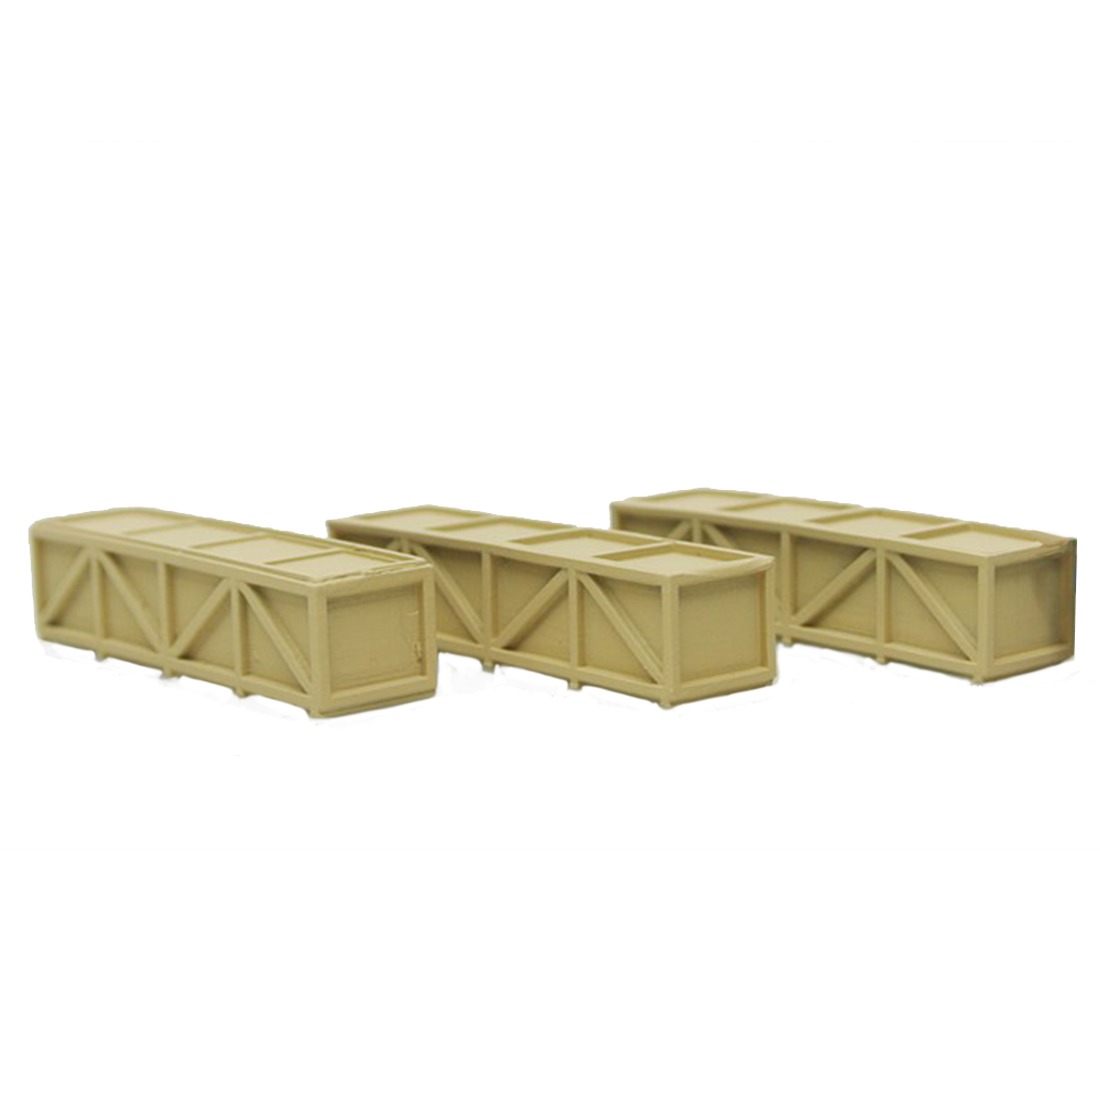 3Pcs 4cm 1:87 HO Scale Train Model Construction Scene Sand Table Cargo Box - Rectangular